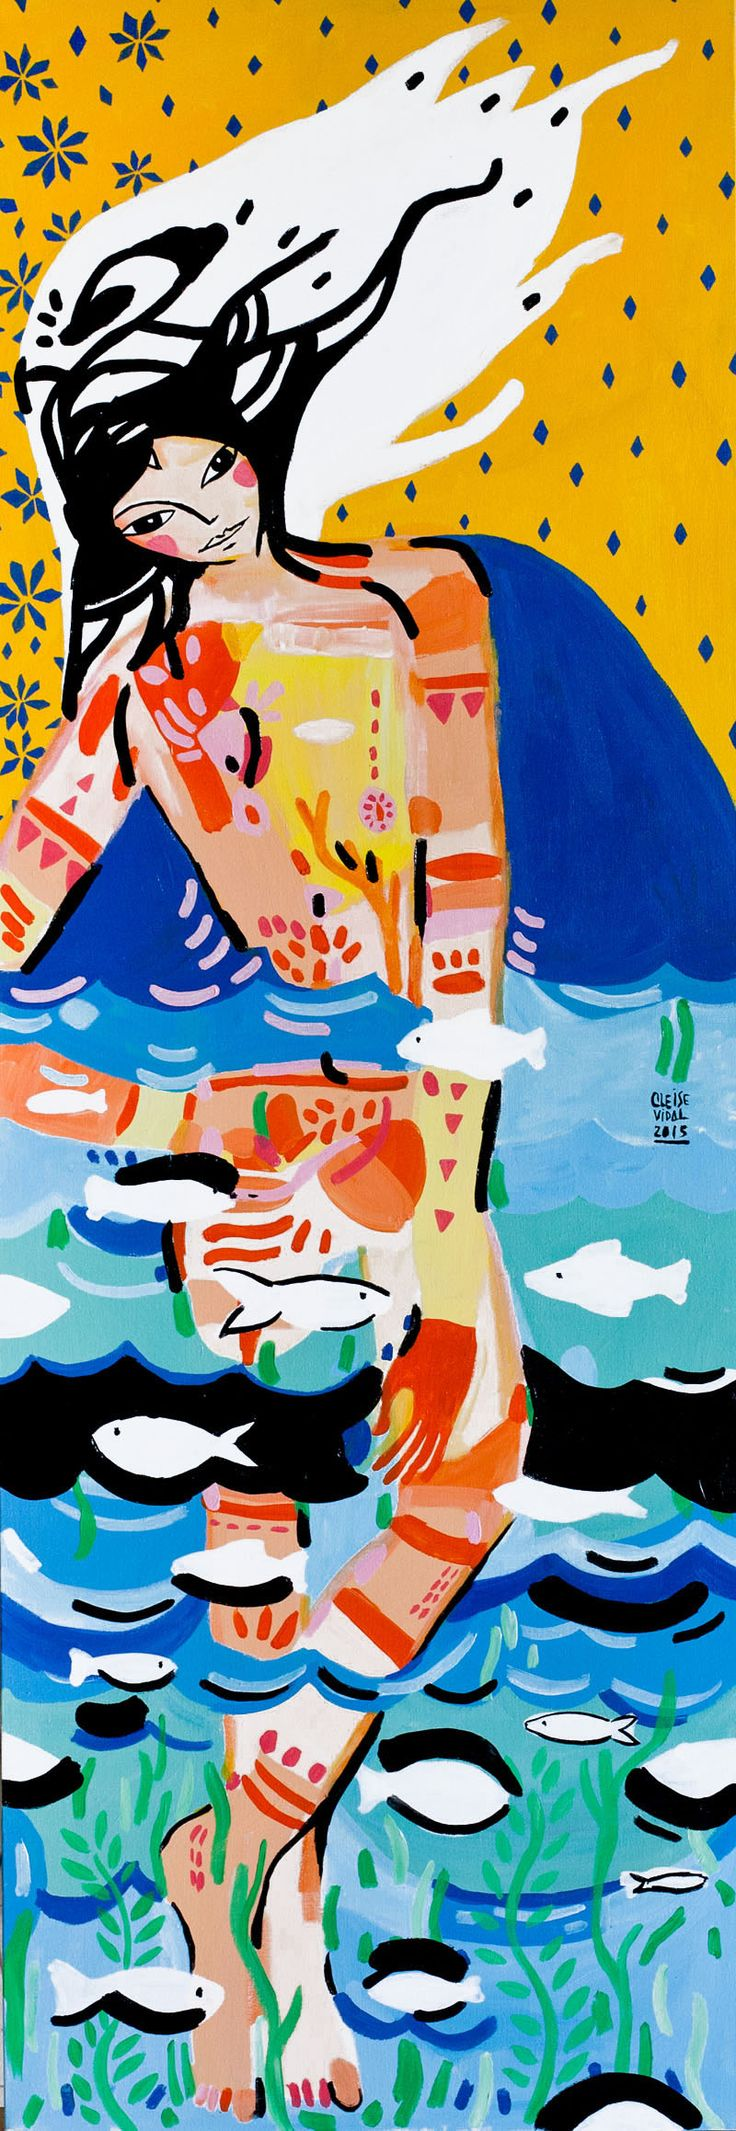 """ I am water"" | Original on canvas | 120x45cm"